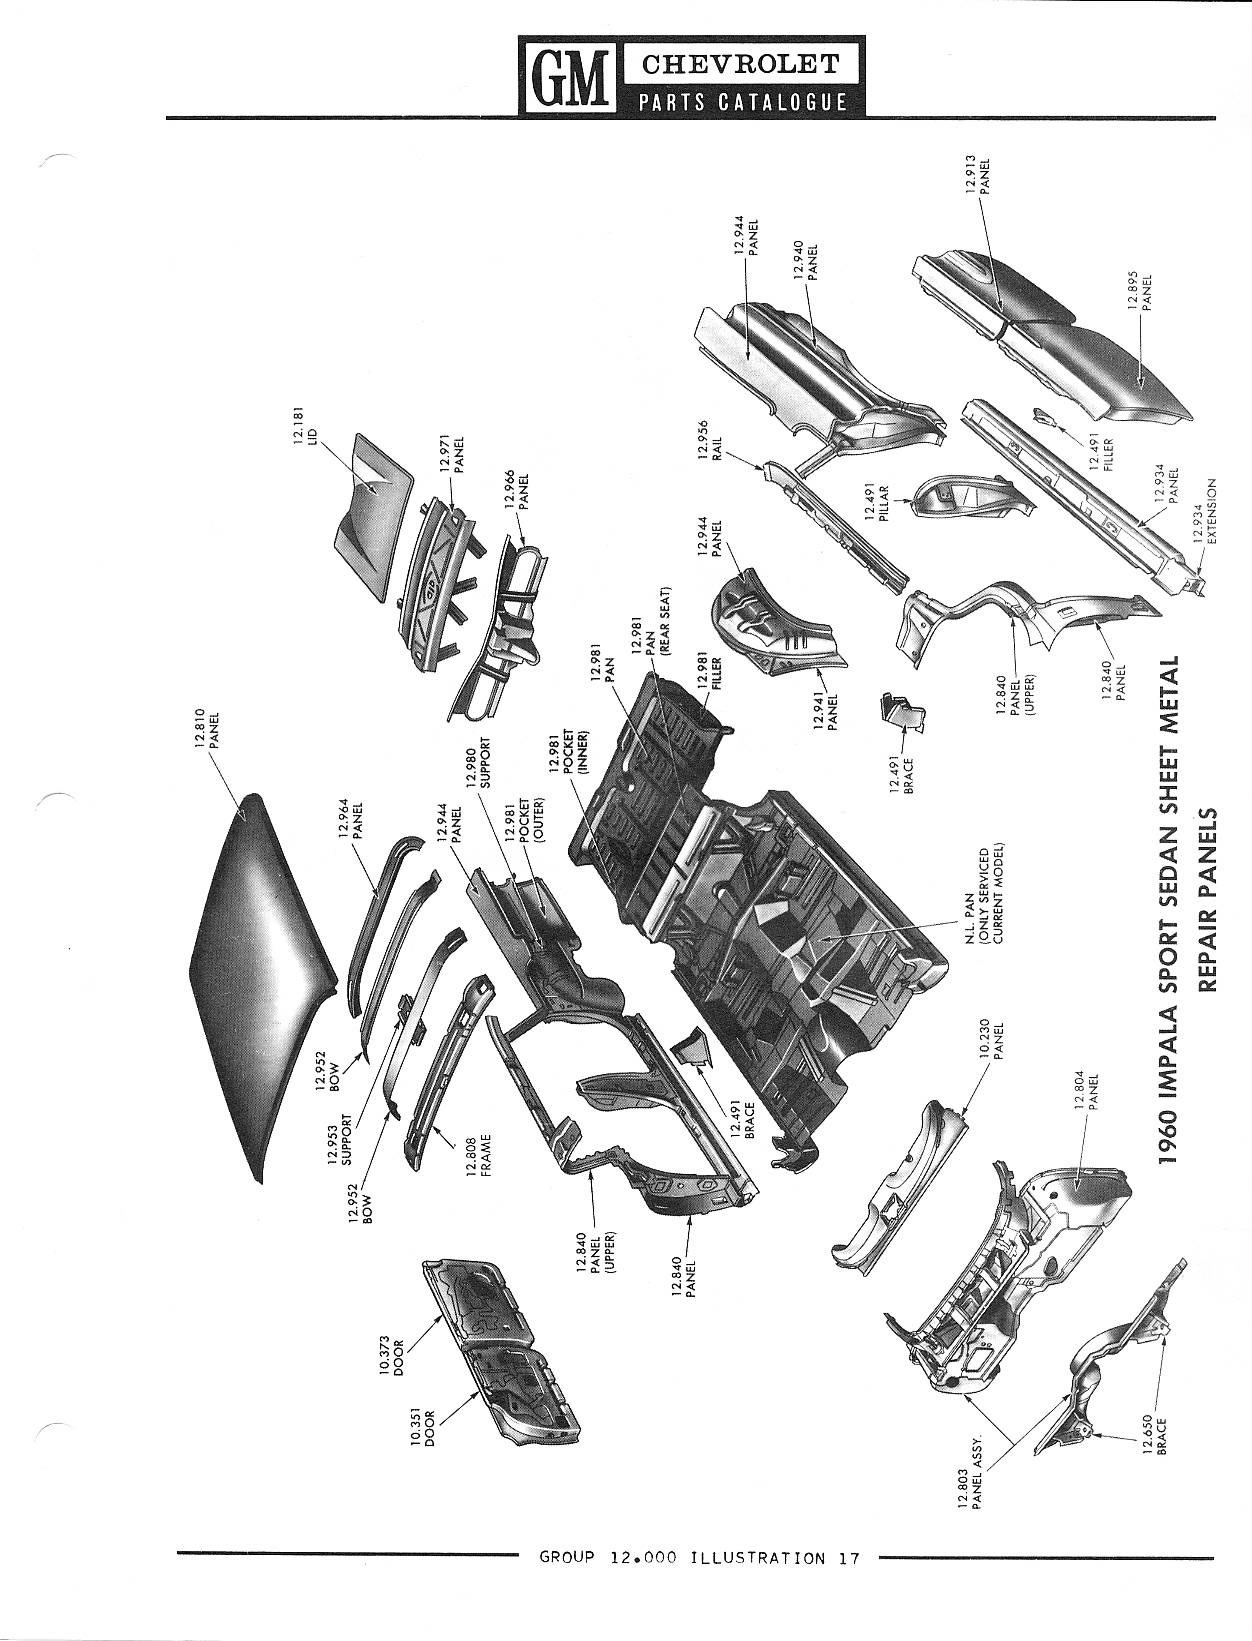 1958-1968 Chevrolet Parts Catalog / Image173.jpg